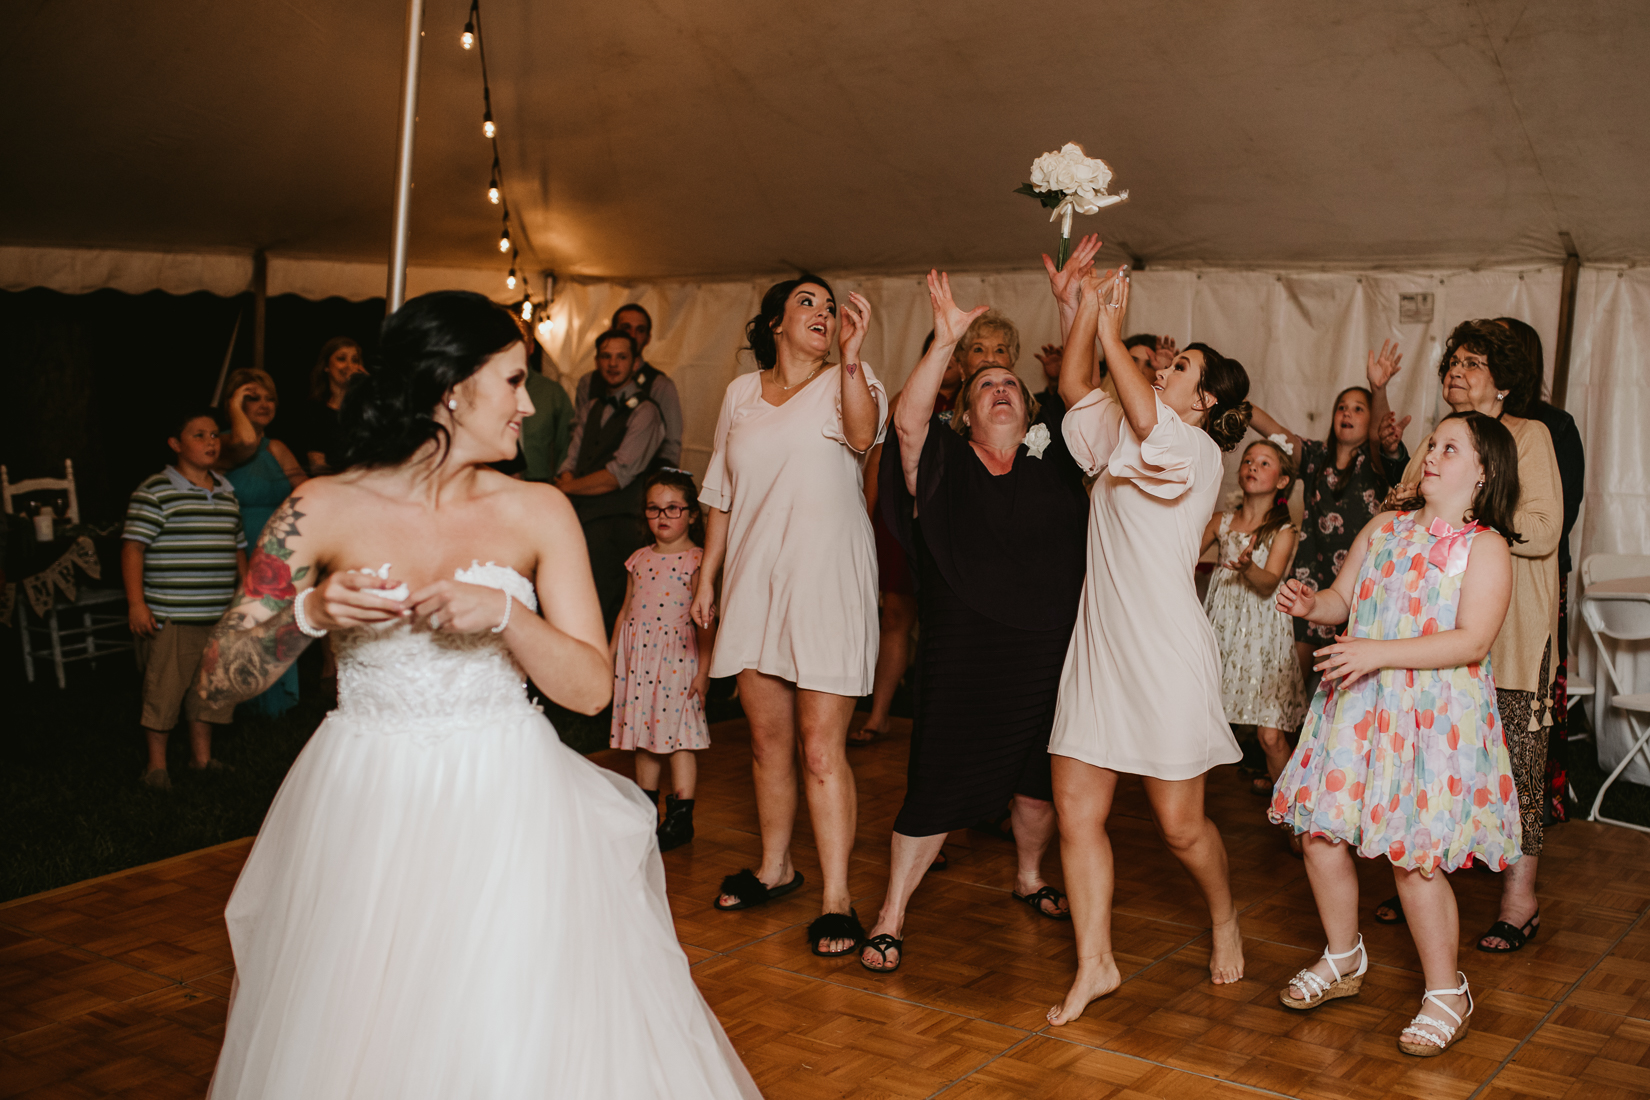 olivia_zay_wedding_09_2018-9085.jpg